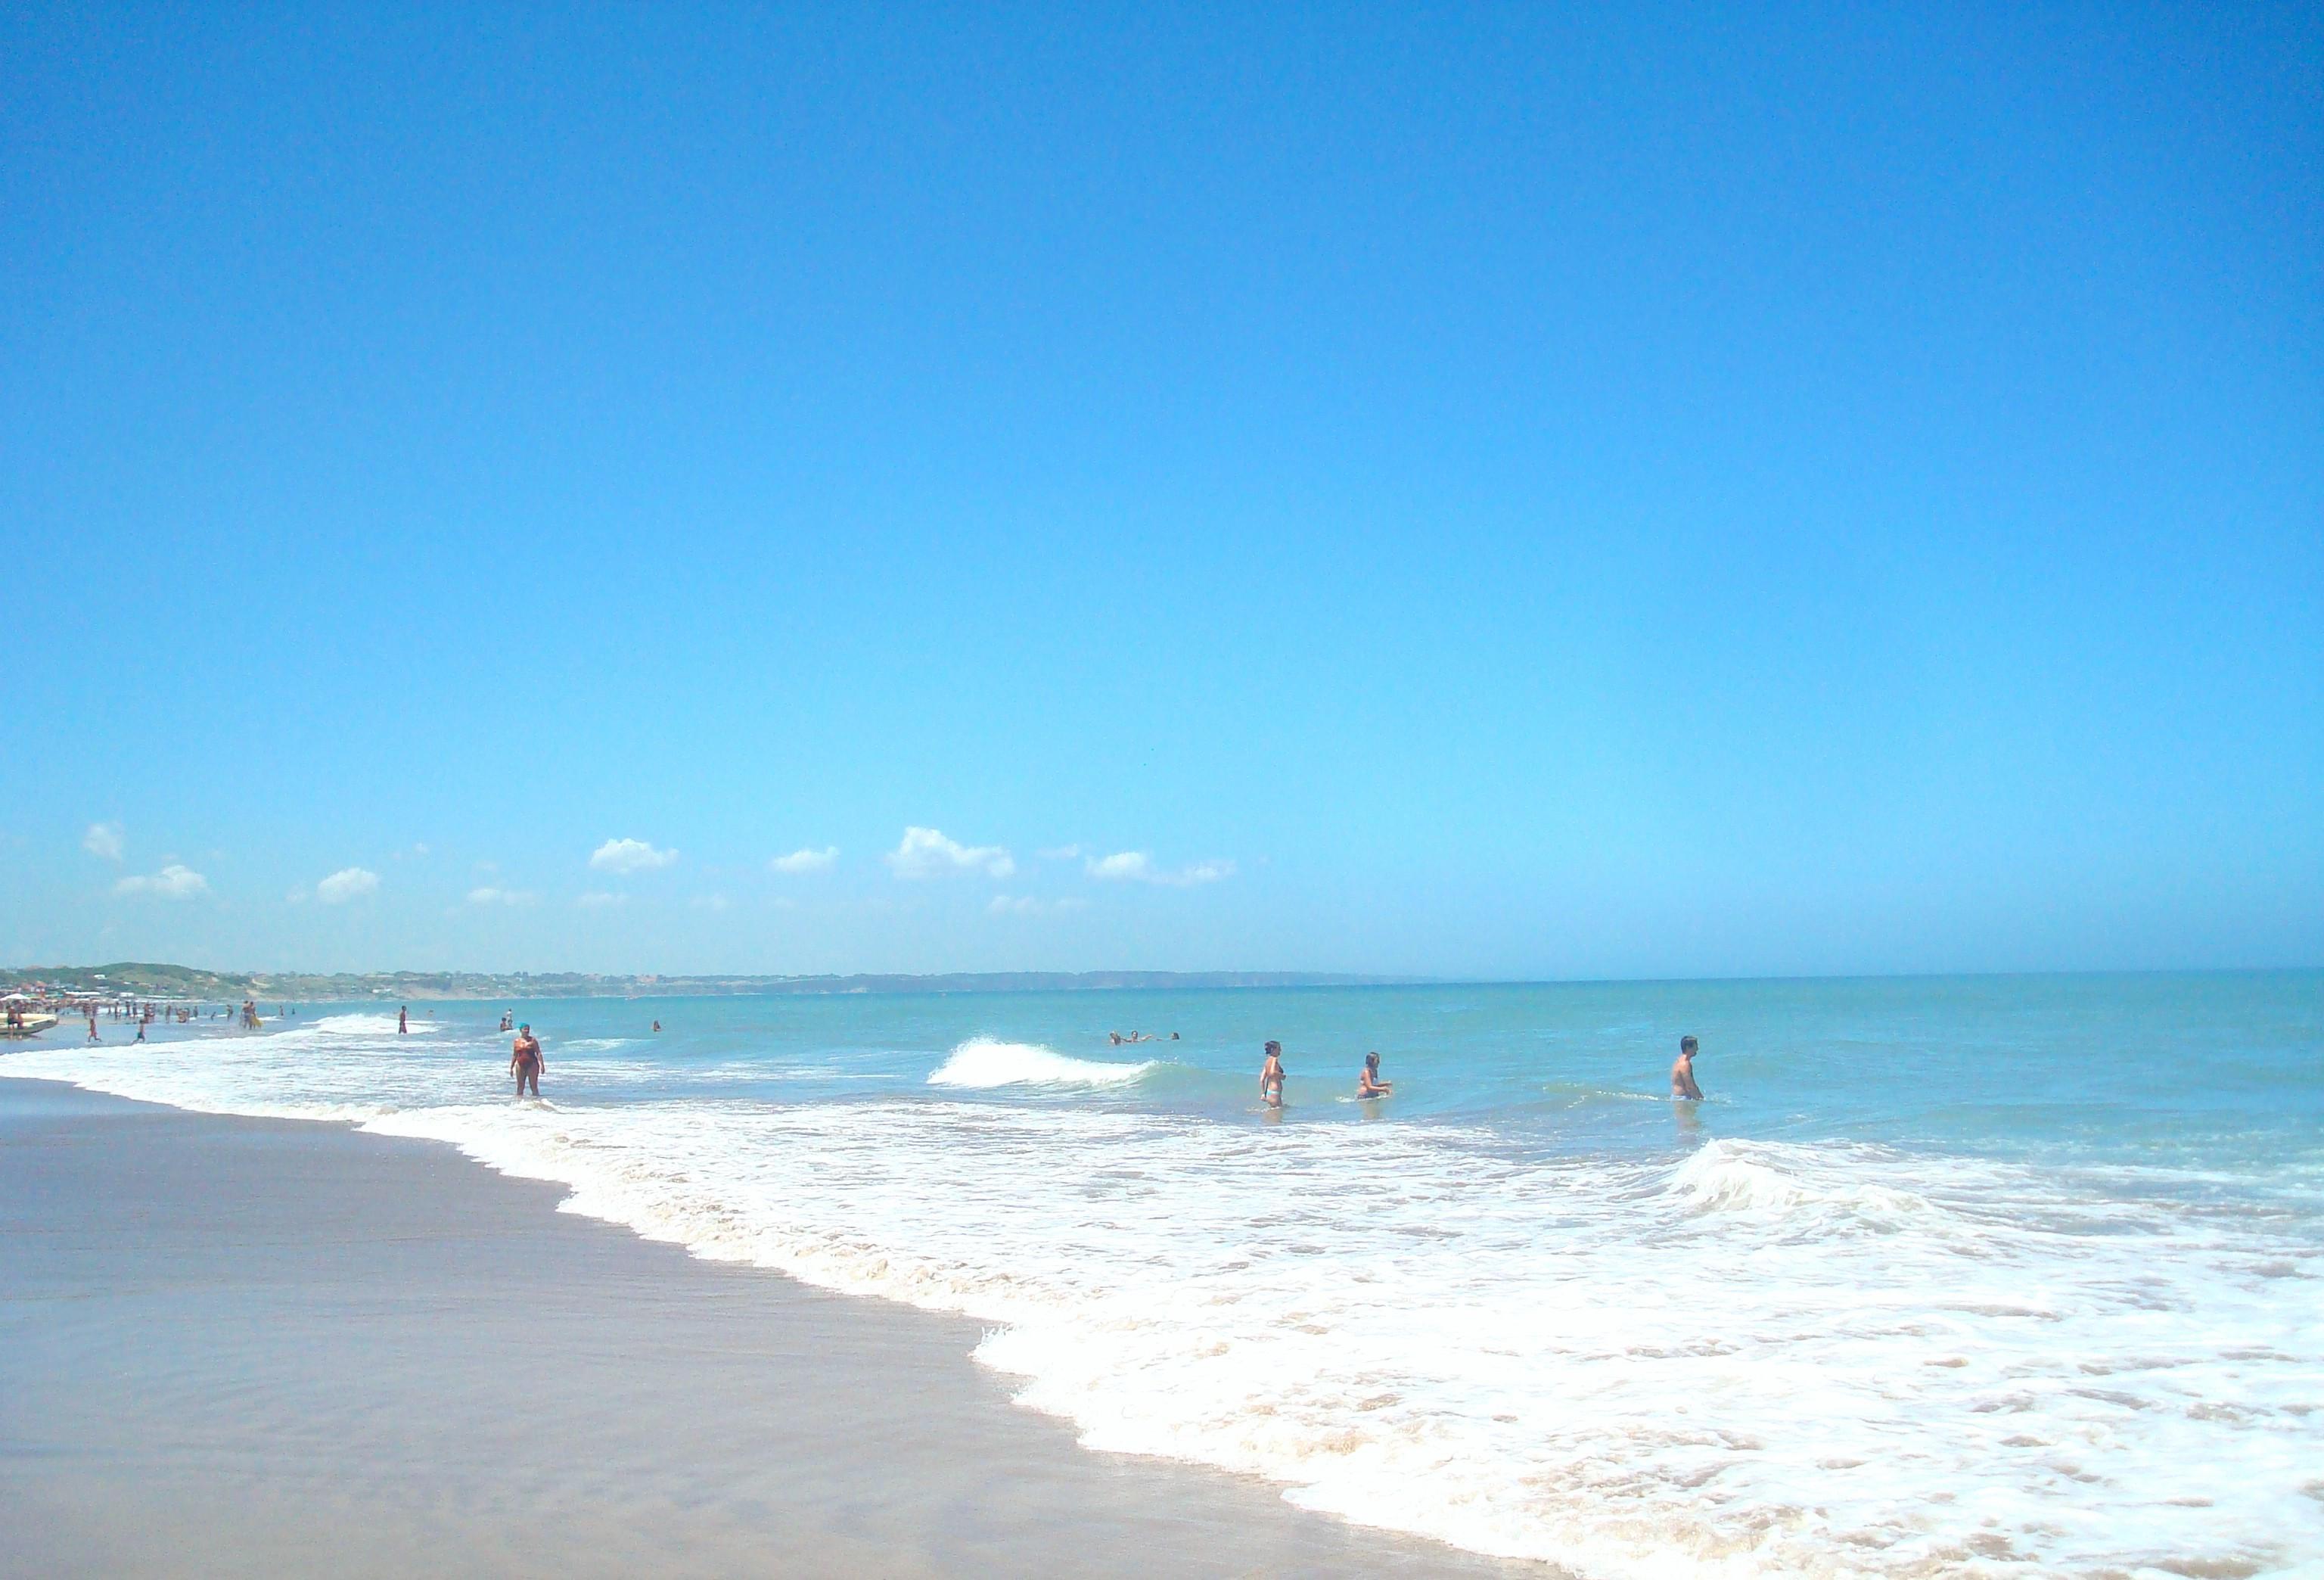 Big pljazh mar del plata v agrentine 2 e1364598274597